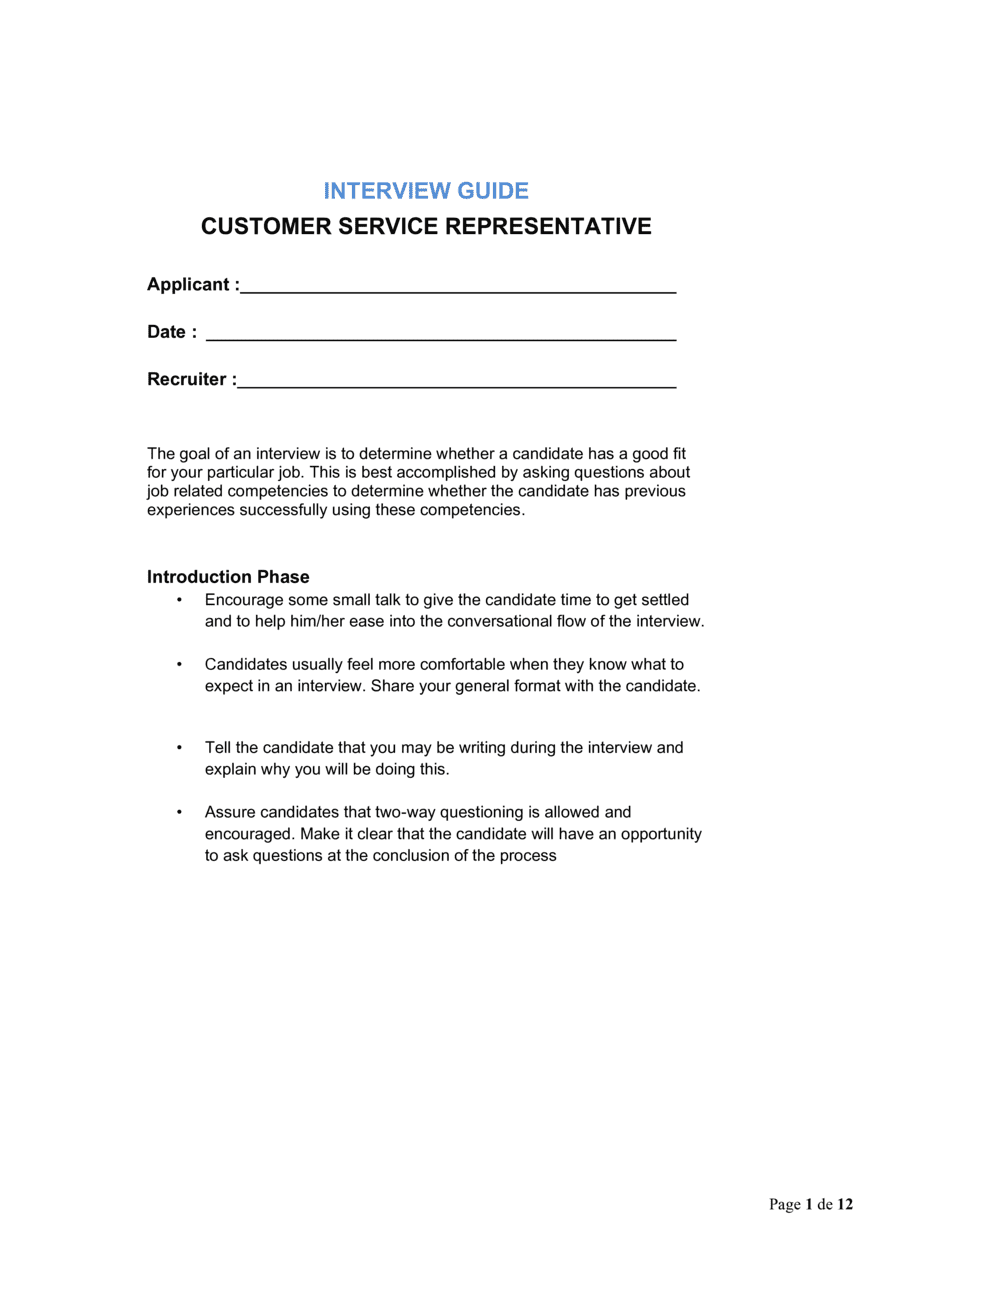 Business-in-a-Box's Interview Guide Customer Service Representative Template